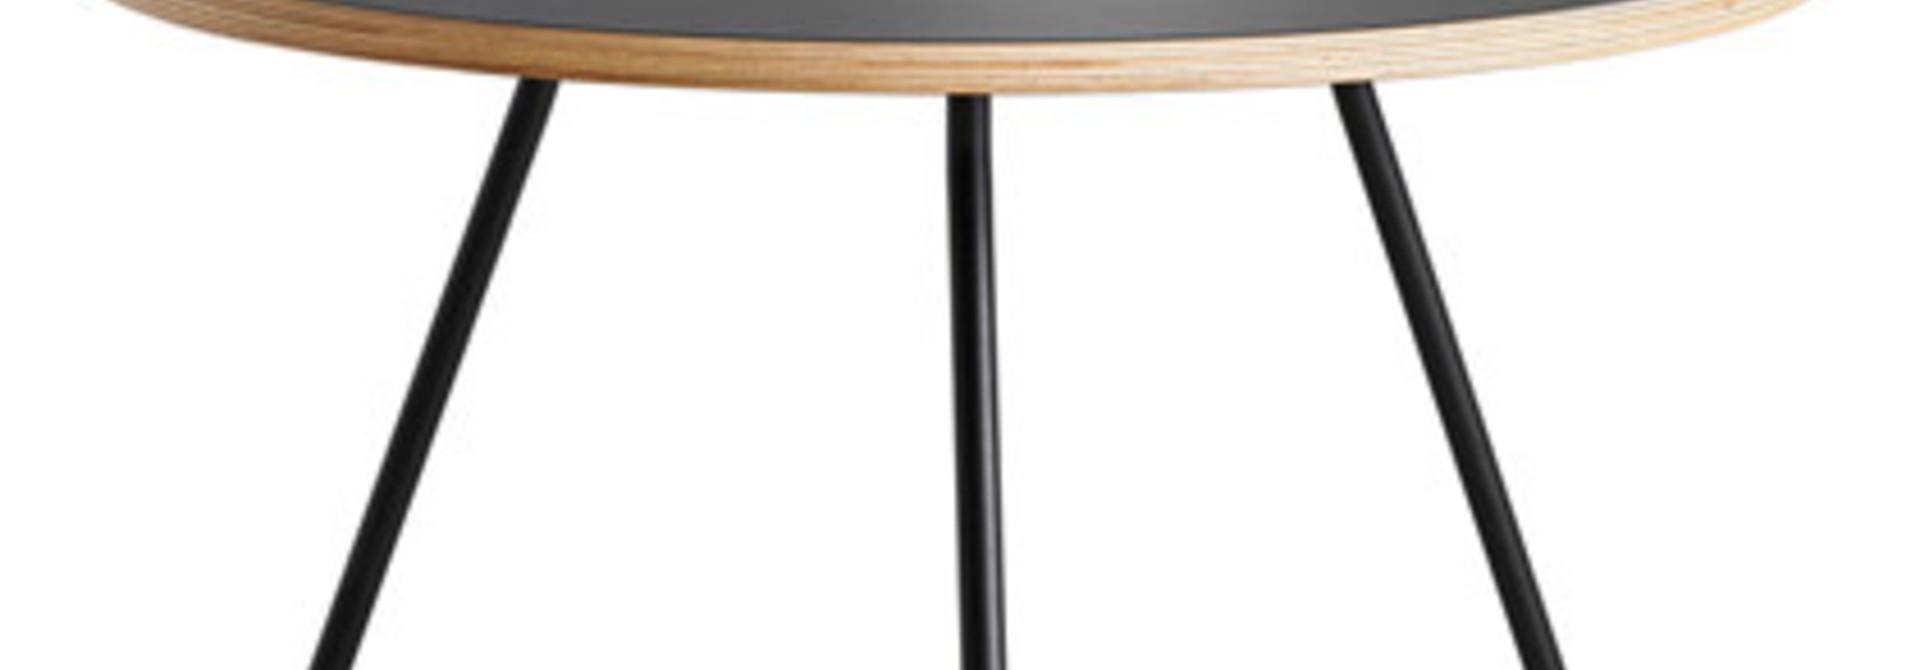 Soround Coffee Table - Black Fenix